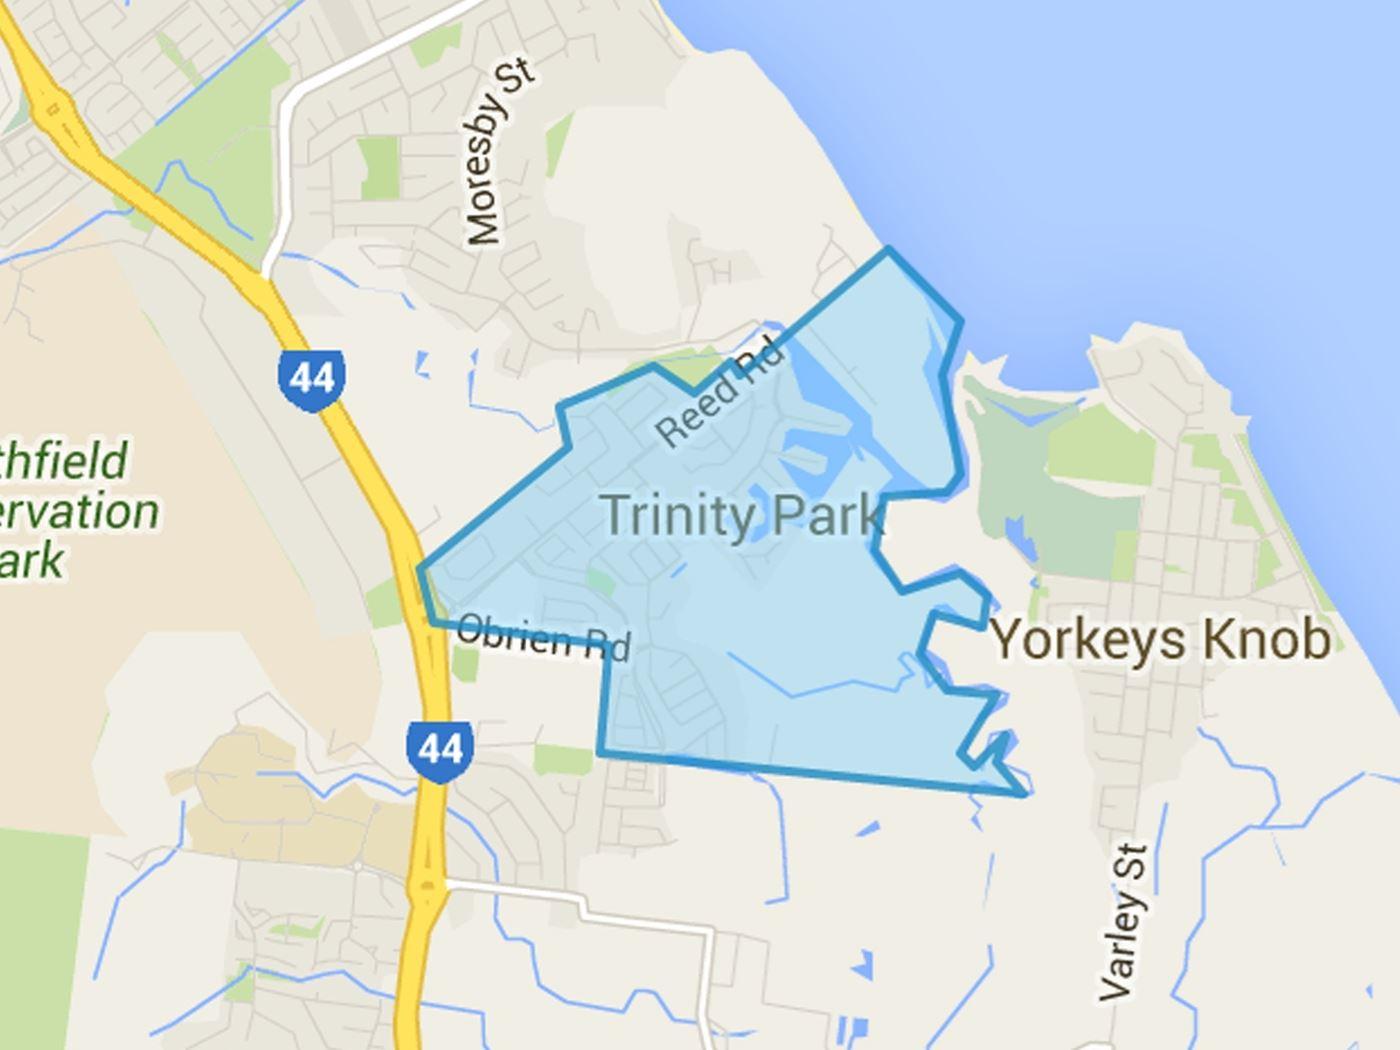 Trinity Park